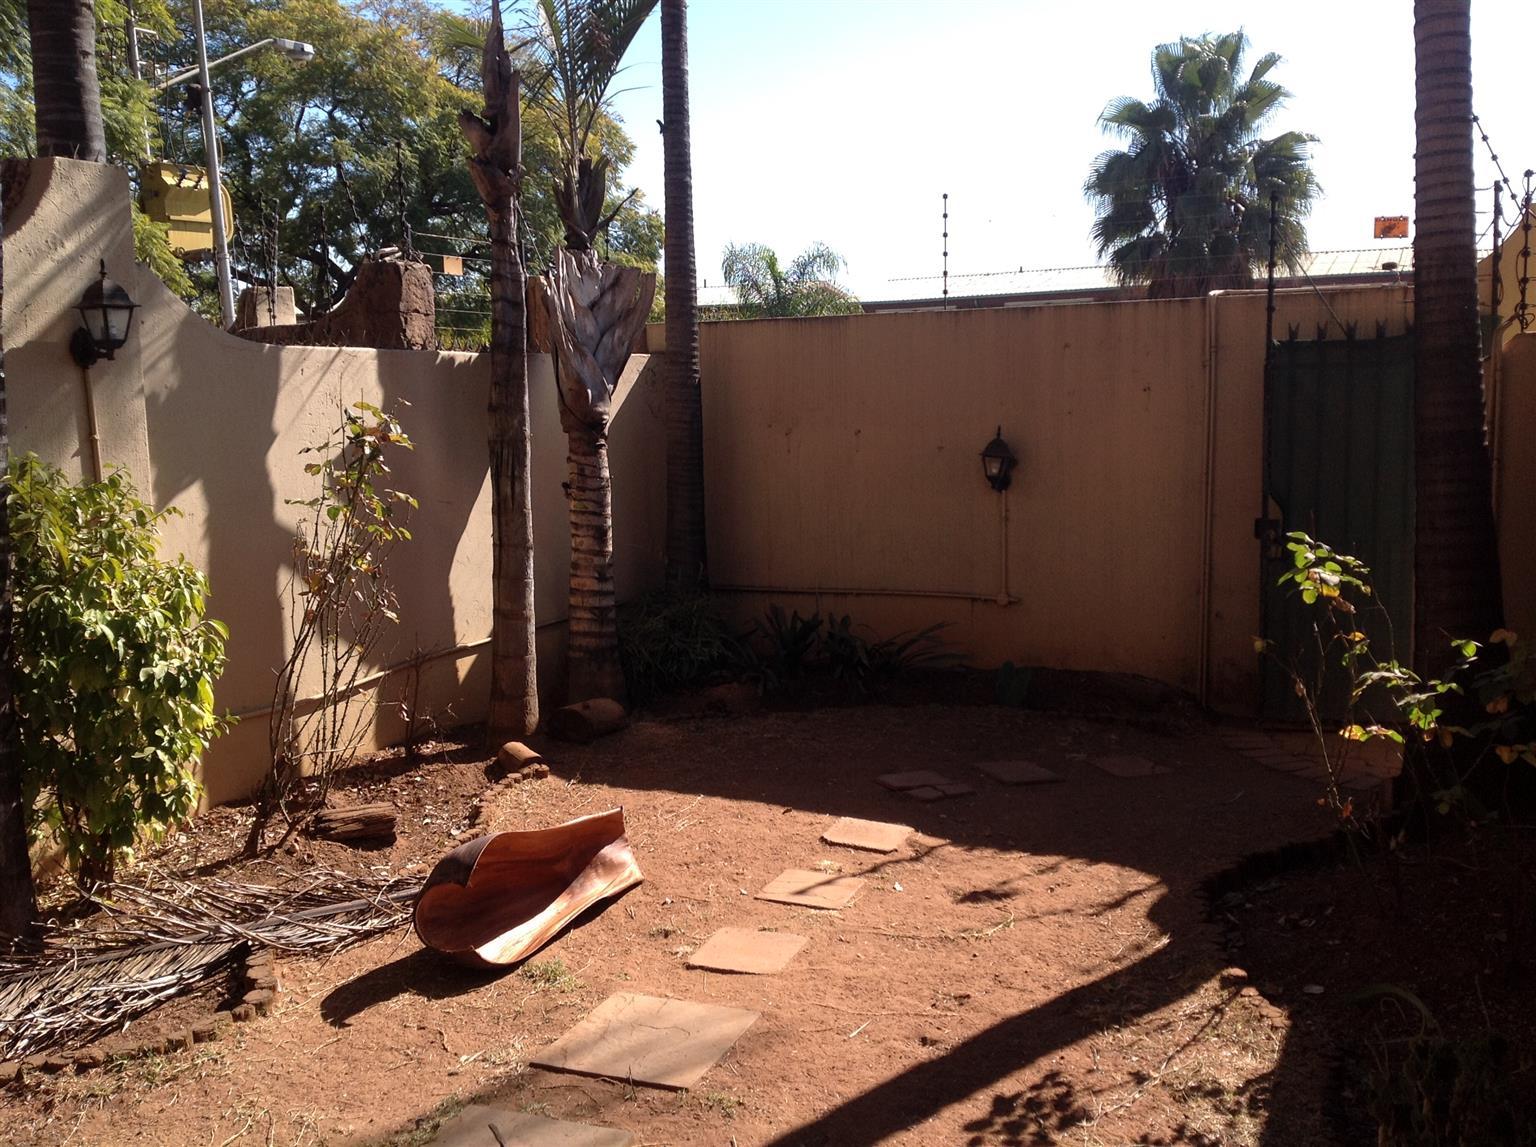 Pretoria Gardens/Tuine Duplex with private garden